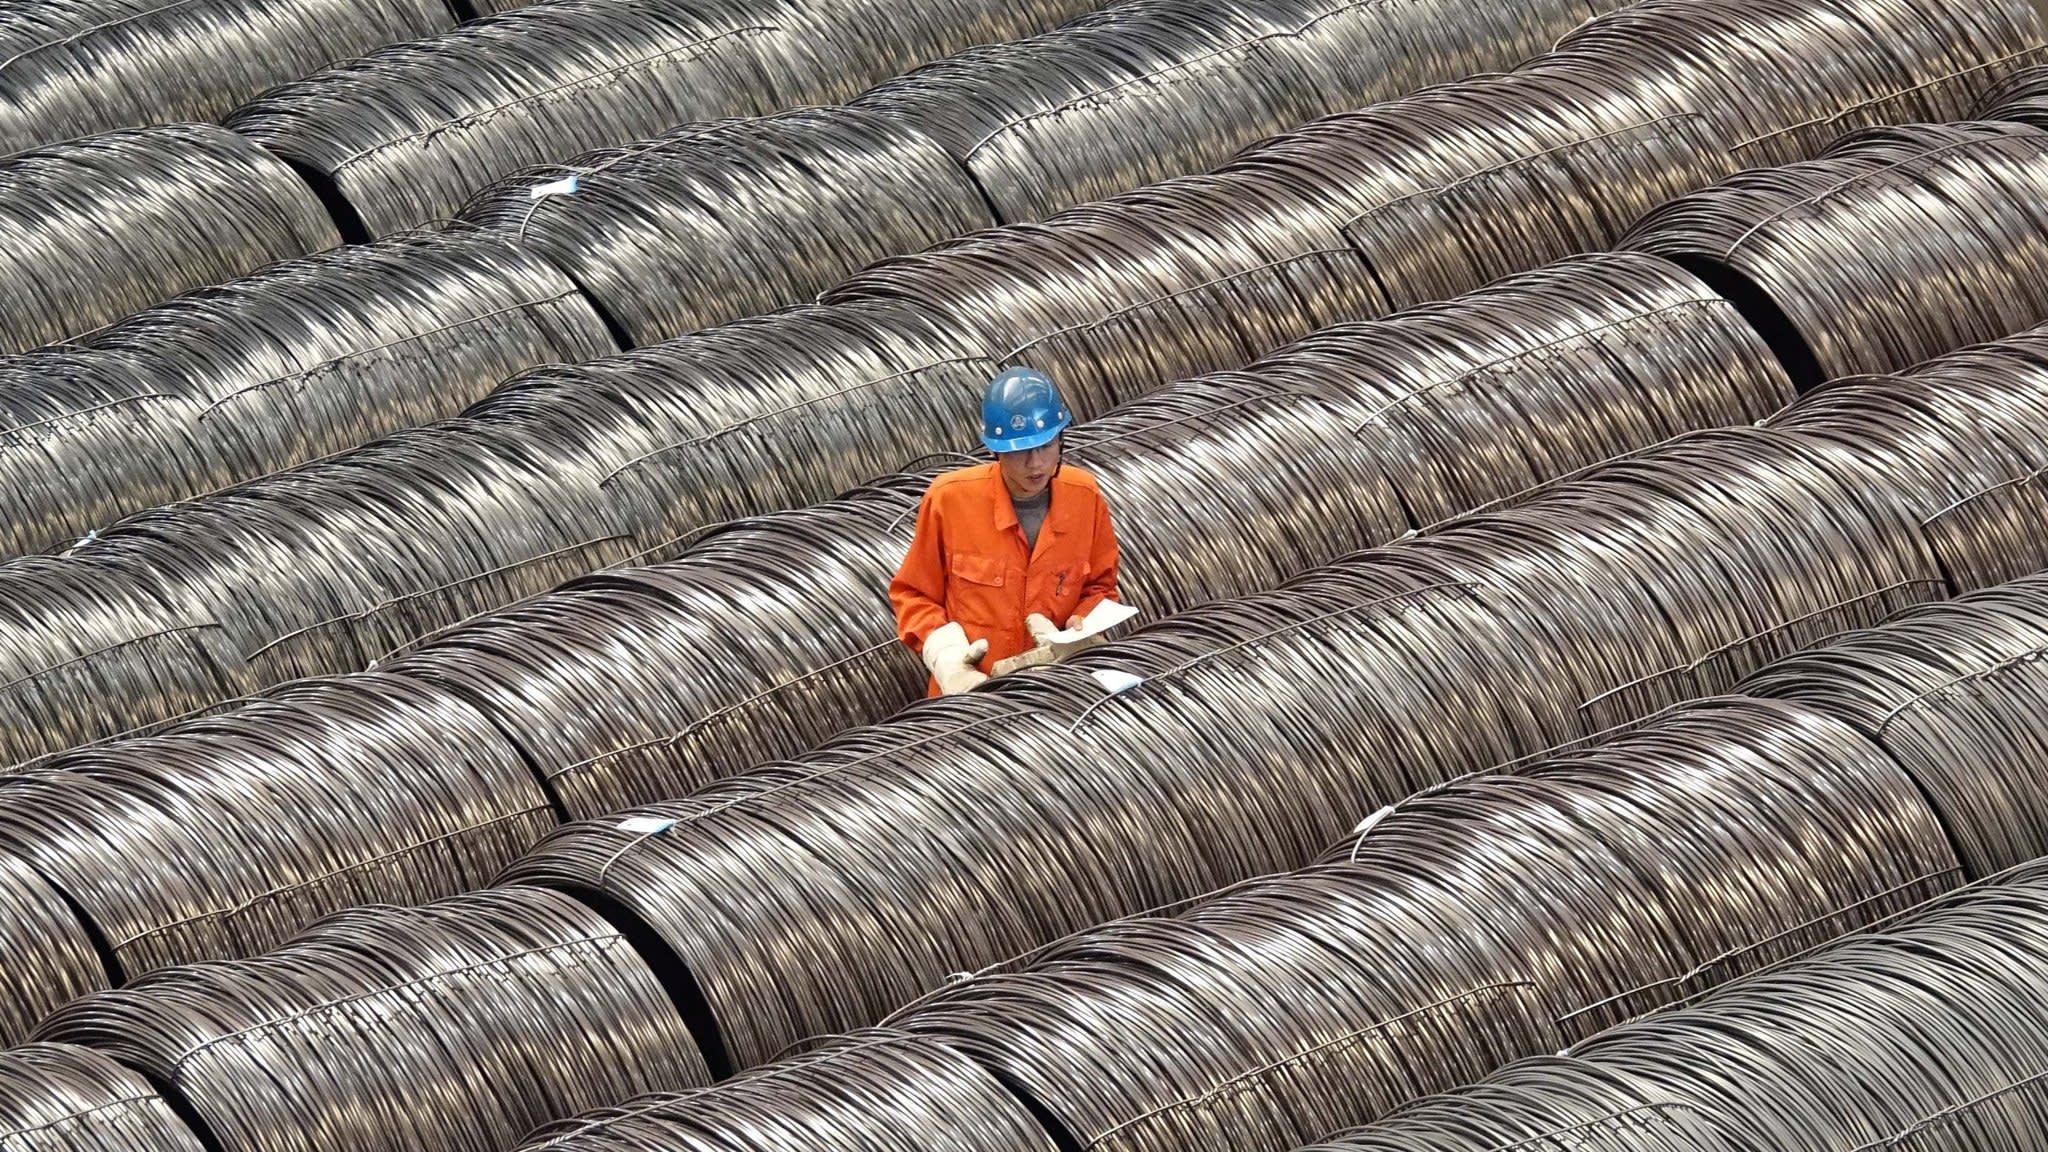 China threatens to retaliate against US metals tariffs